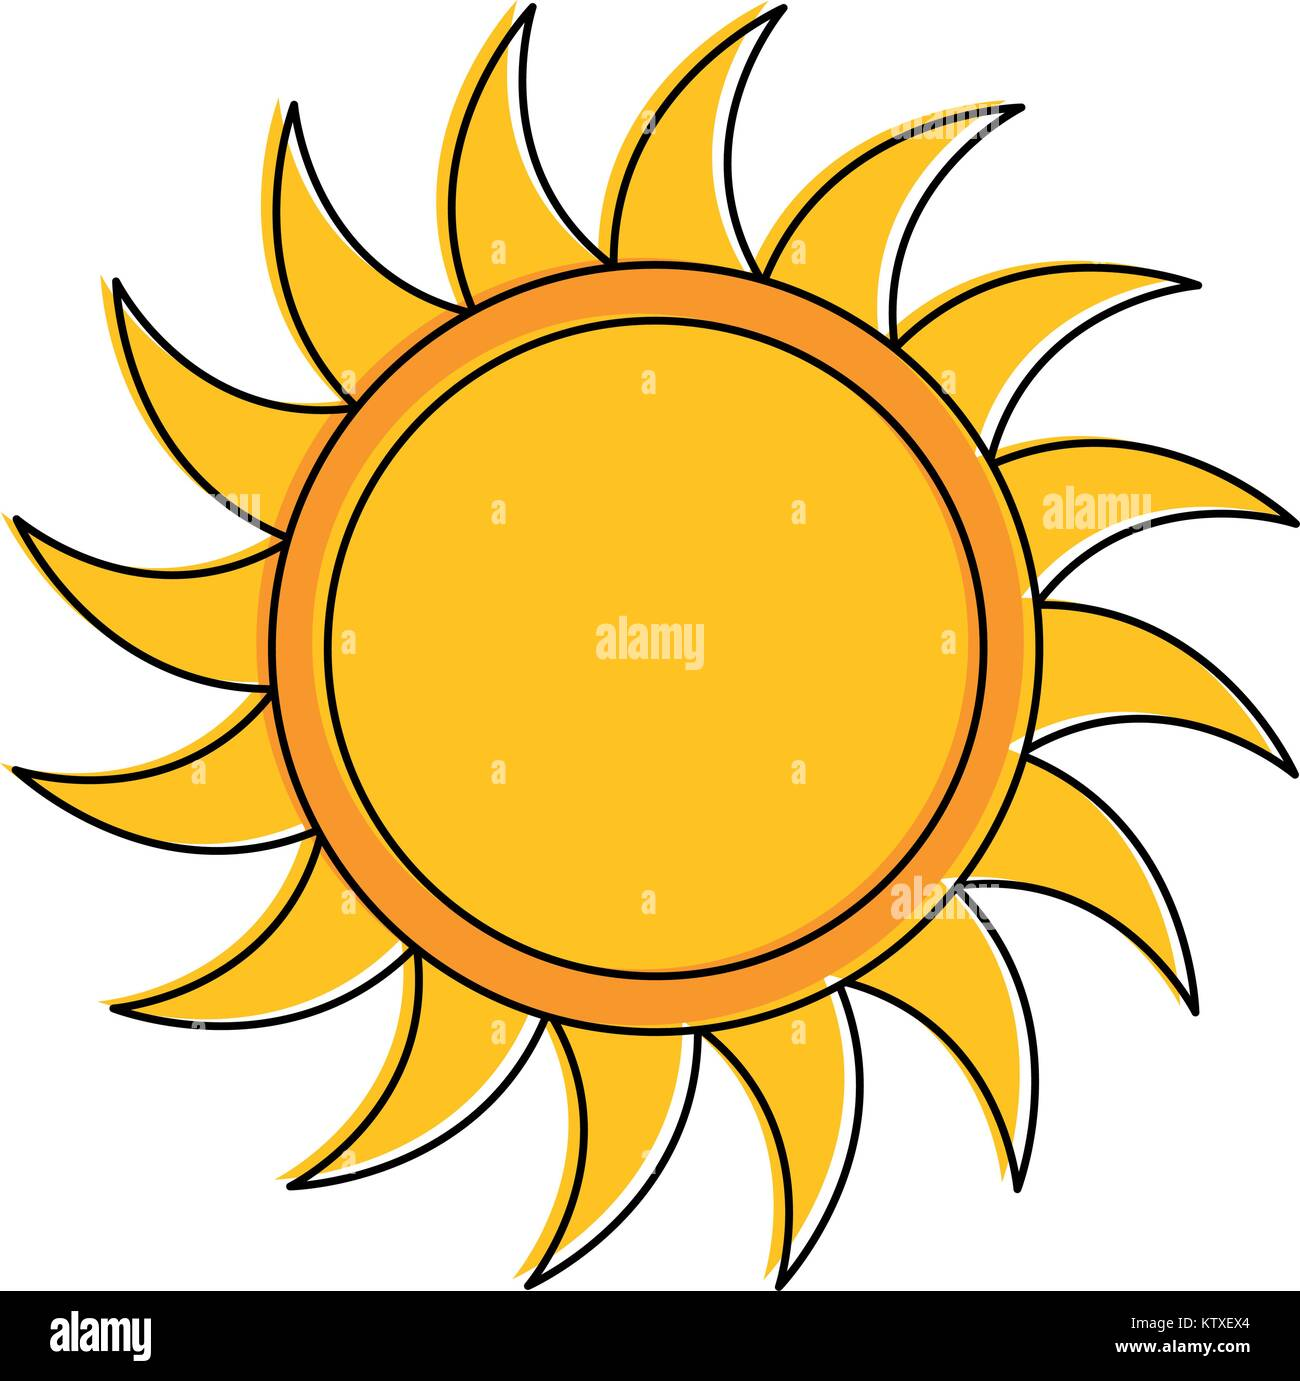 summer sun isolated icon - Stock Image